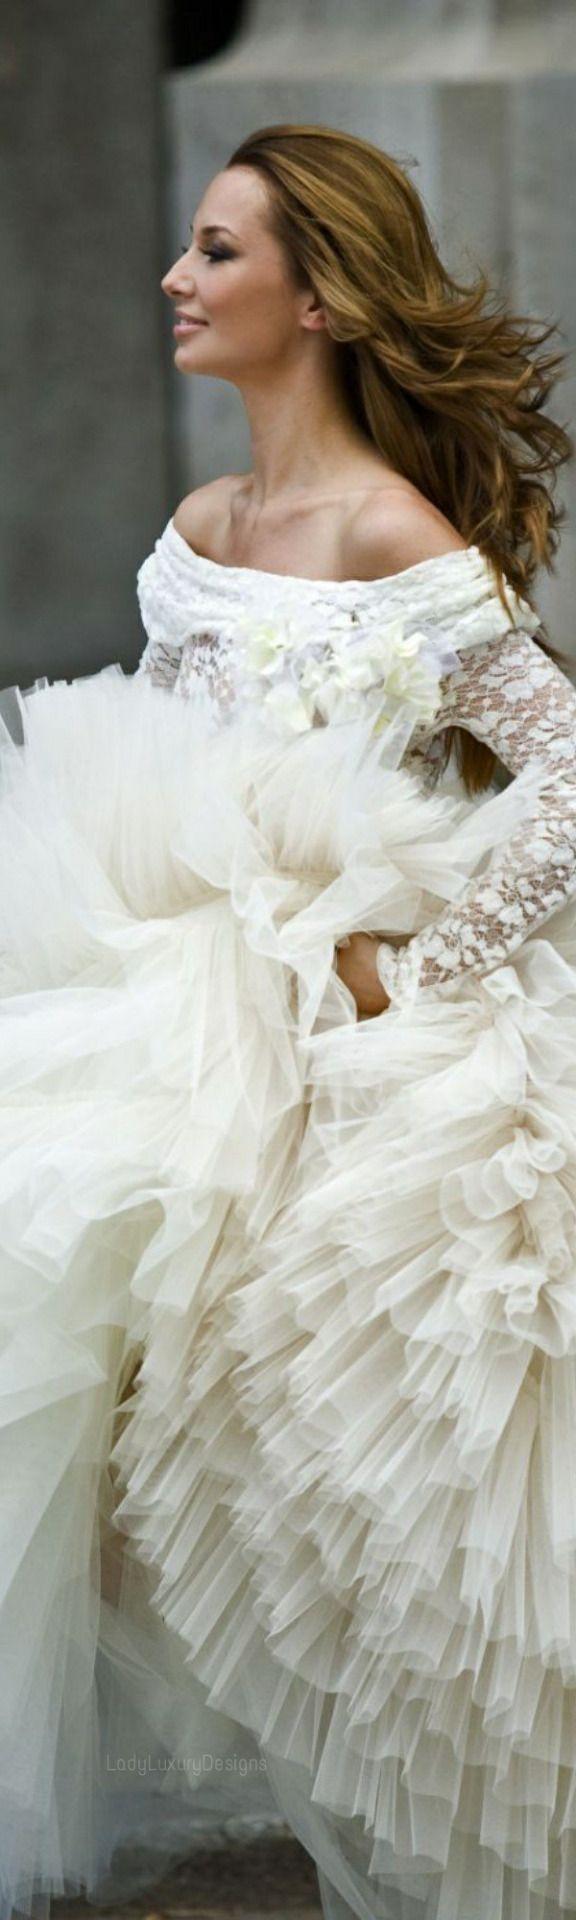 Beautiful Bride - Ladyluxury7